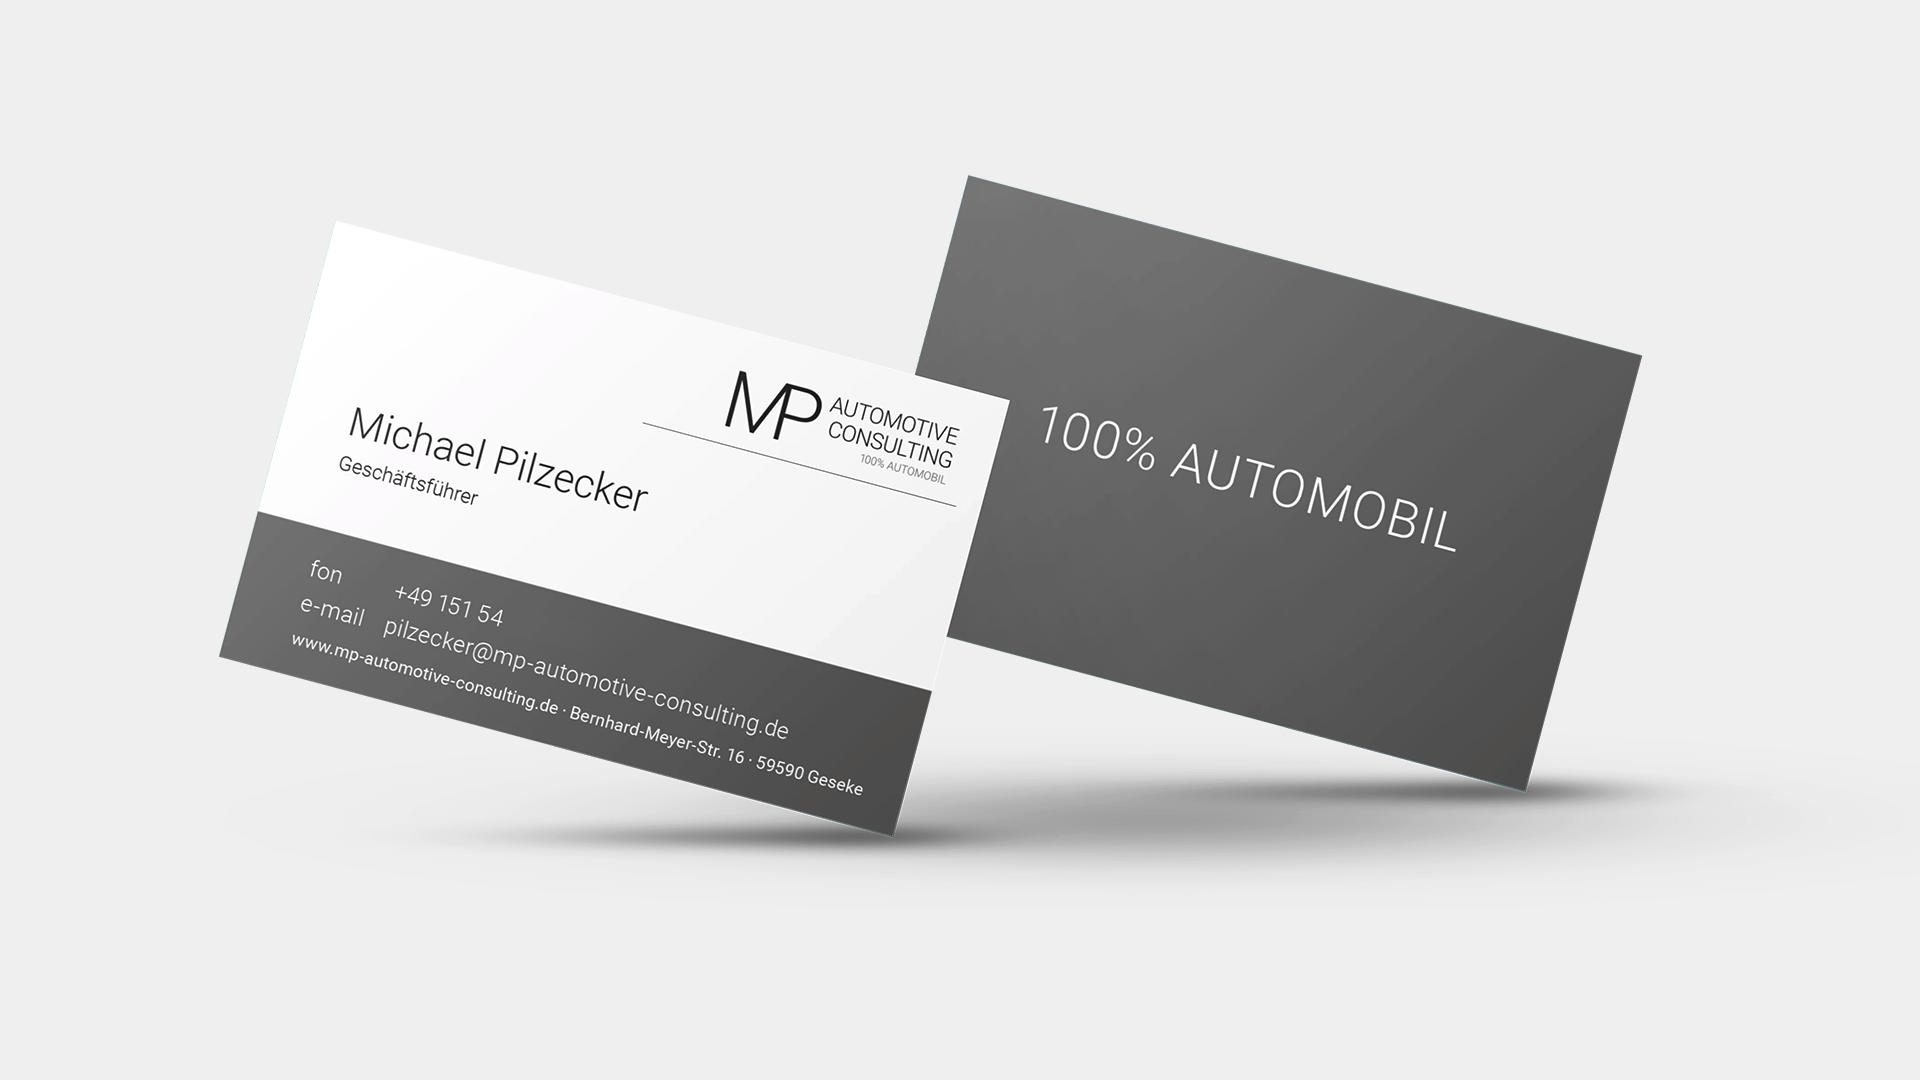 etcetc Werbeagentur MP Automotive Visitenkarten